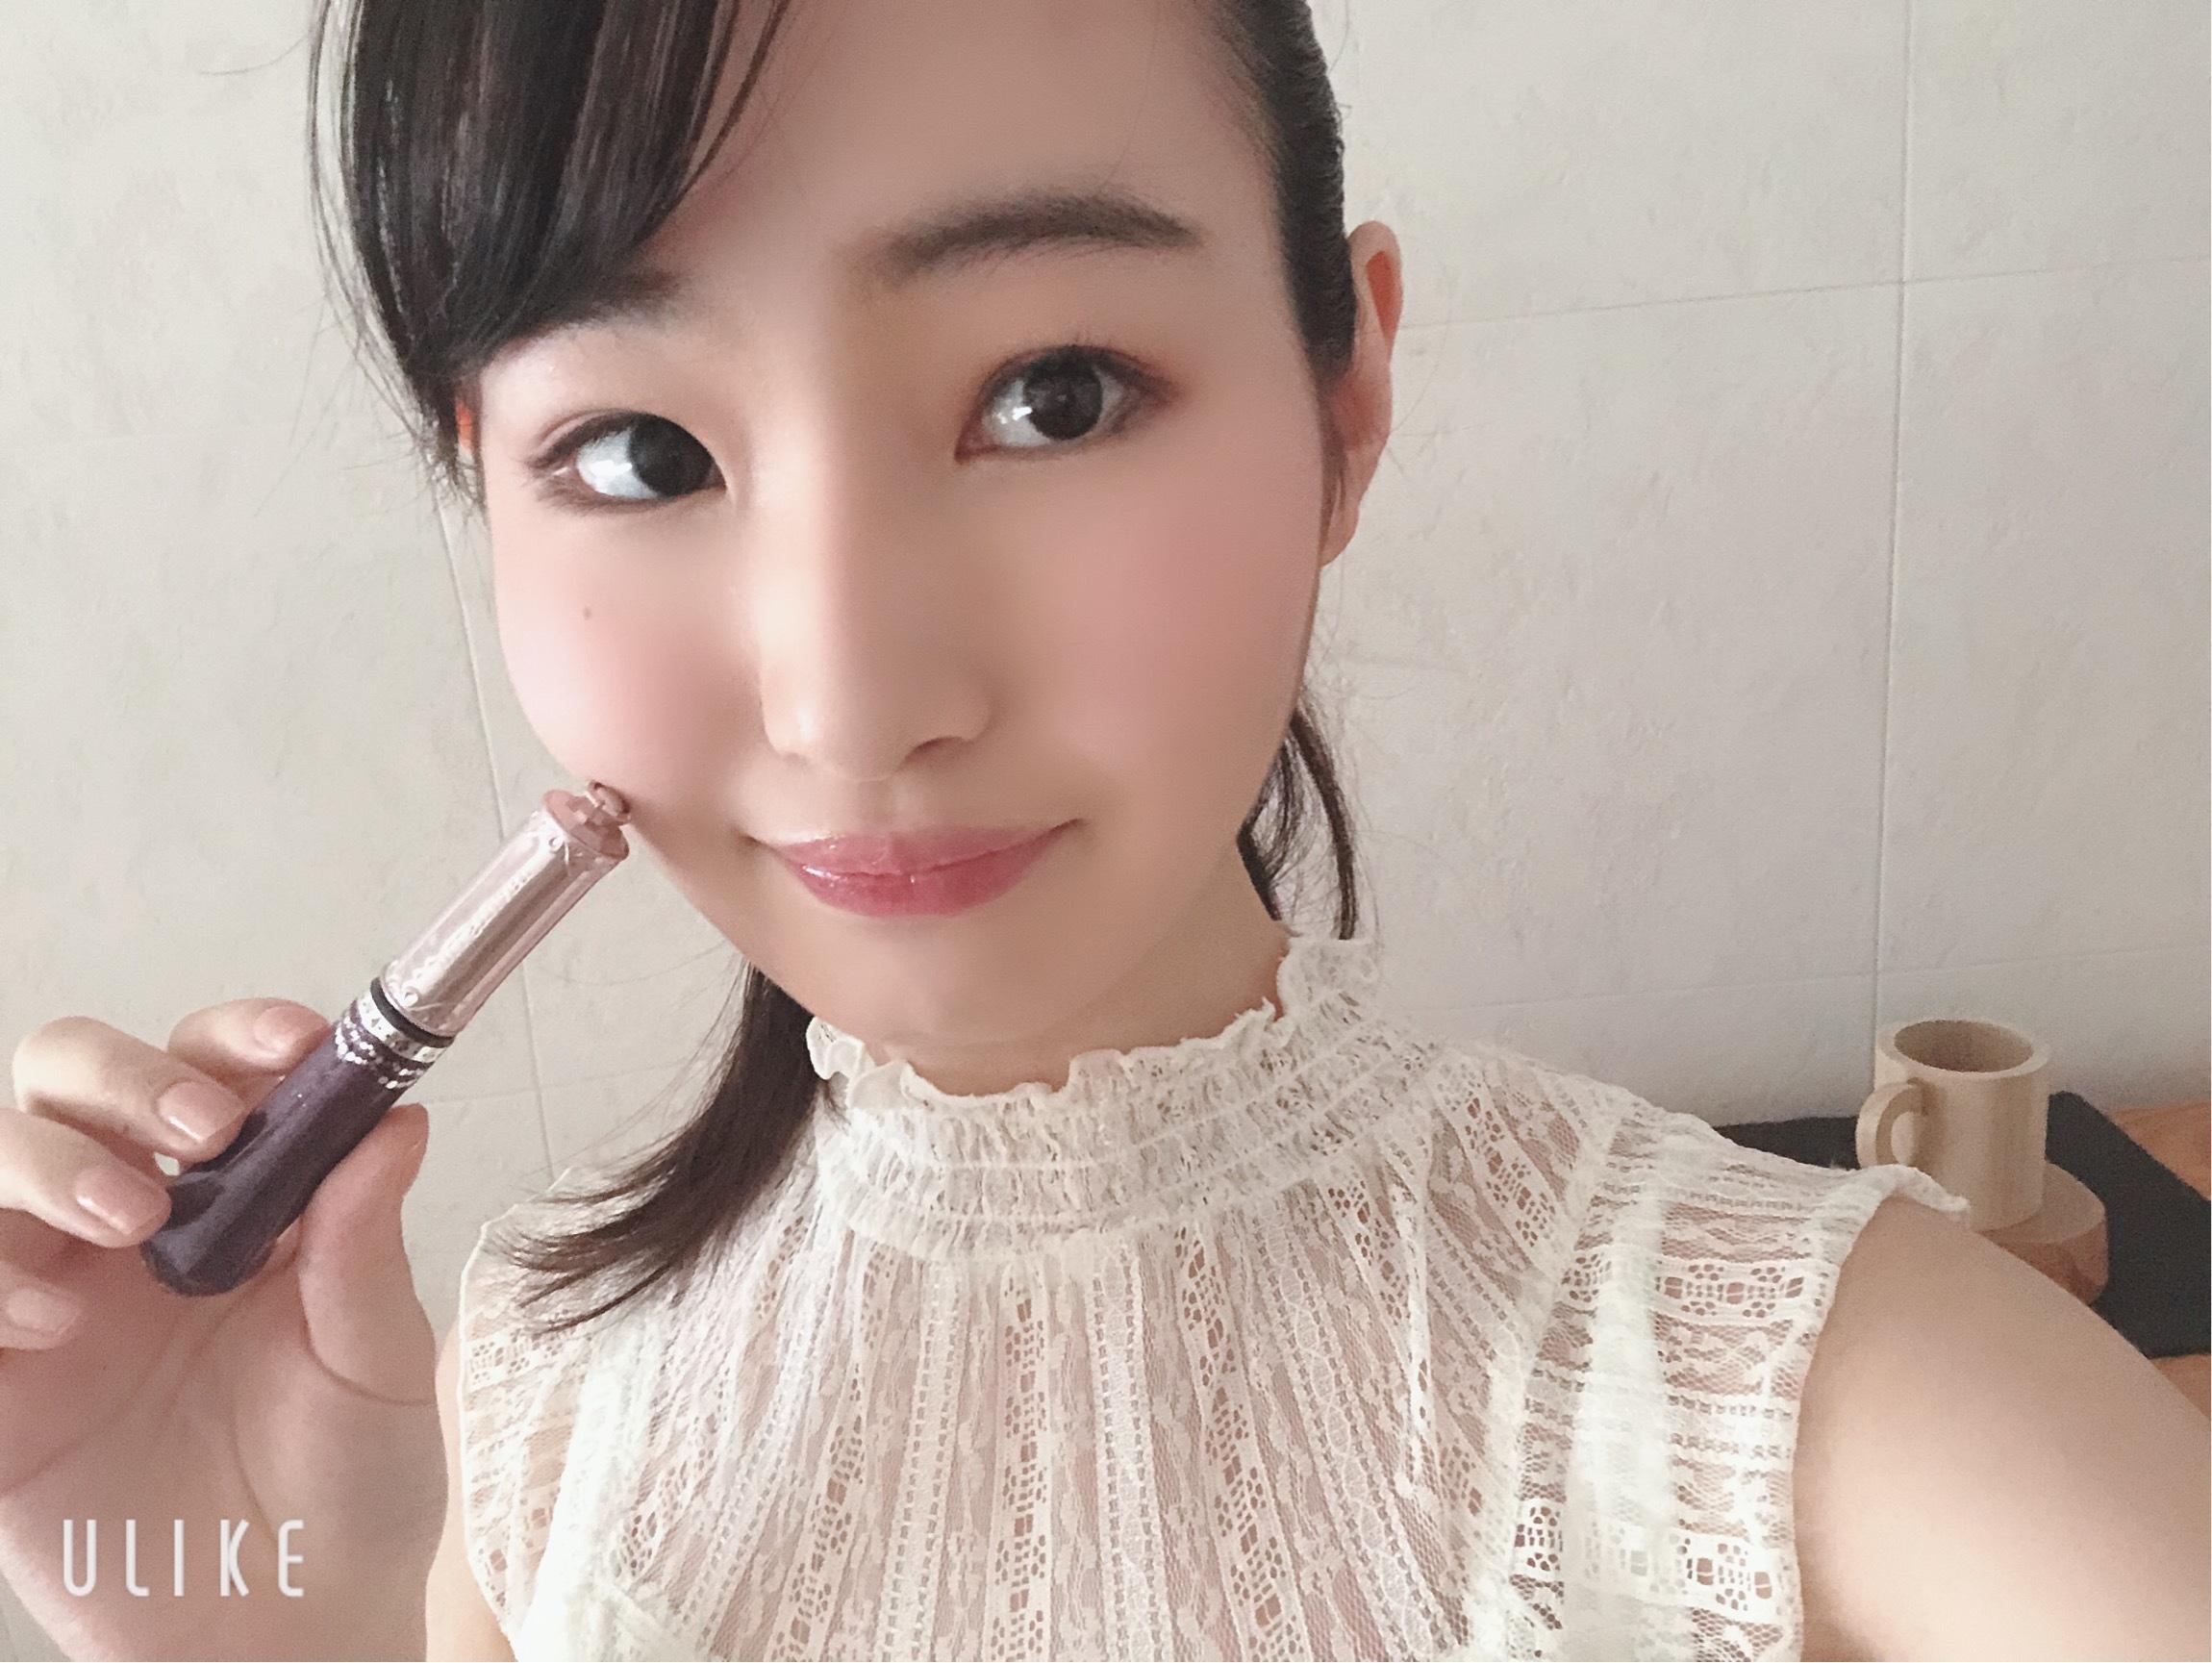 JILLの新作コスメが可愛すぎる♡①ぶどうリップ?!_1_2-2